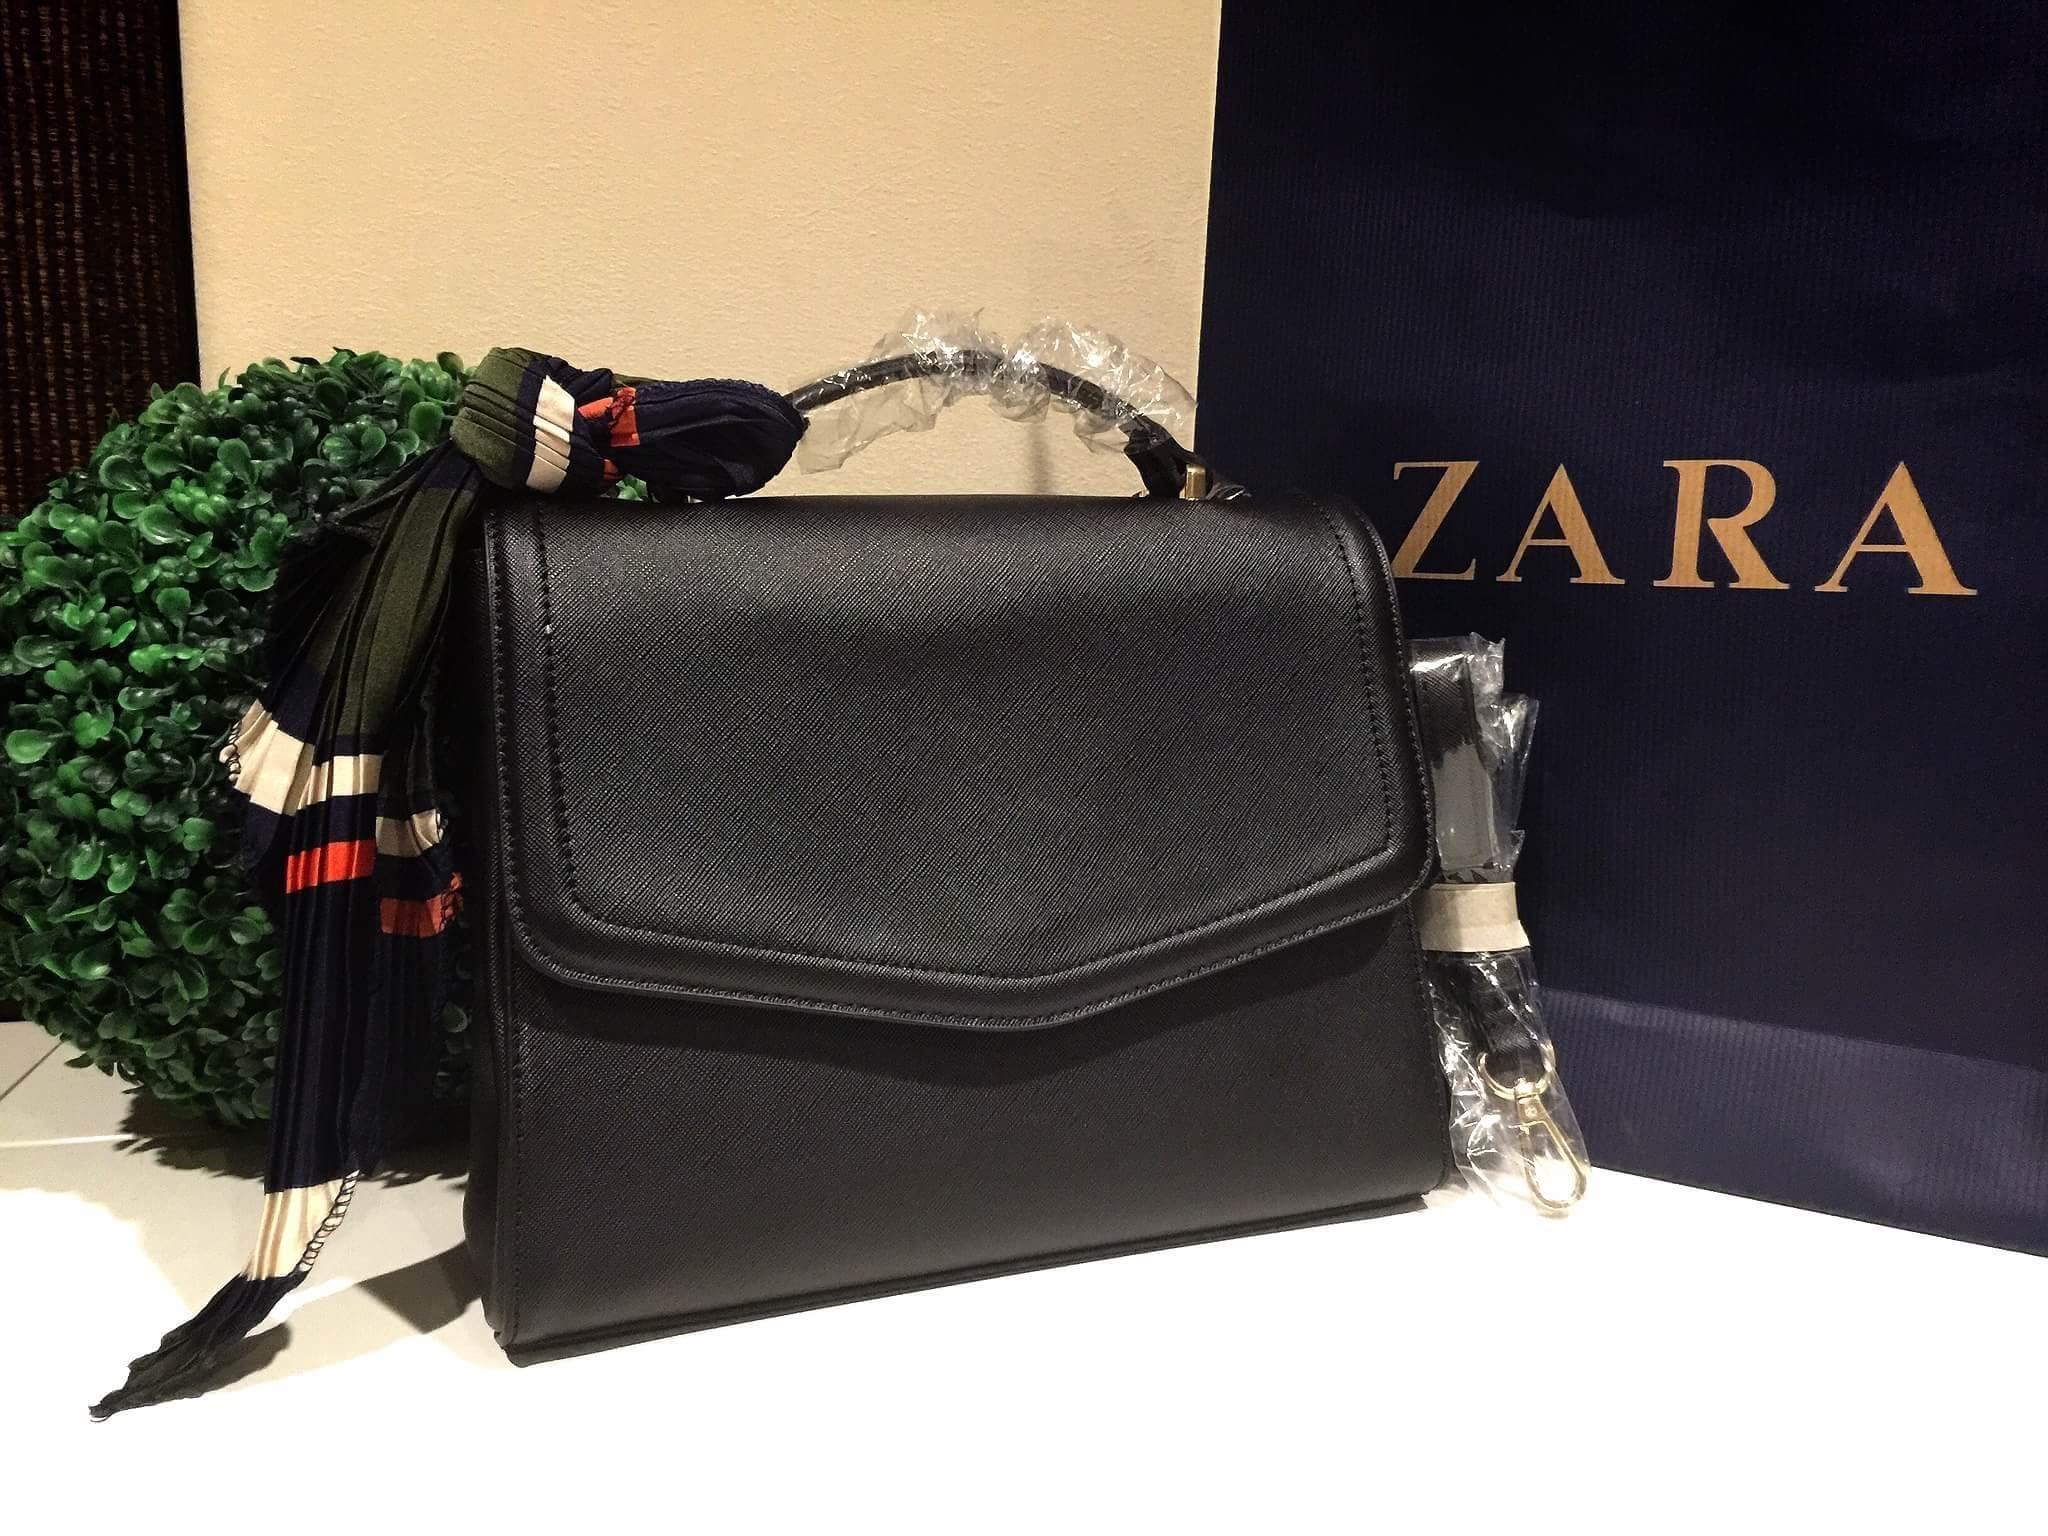 ZARA Convertible Backpack With Scarf 2016 ทรงสวยหรูสไตล์ PRADA